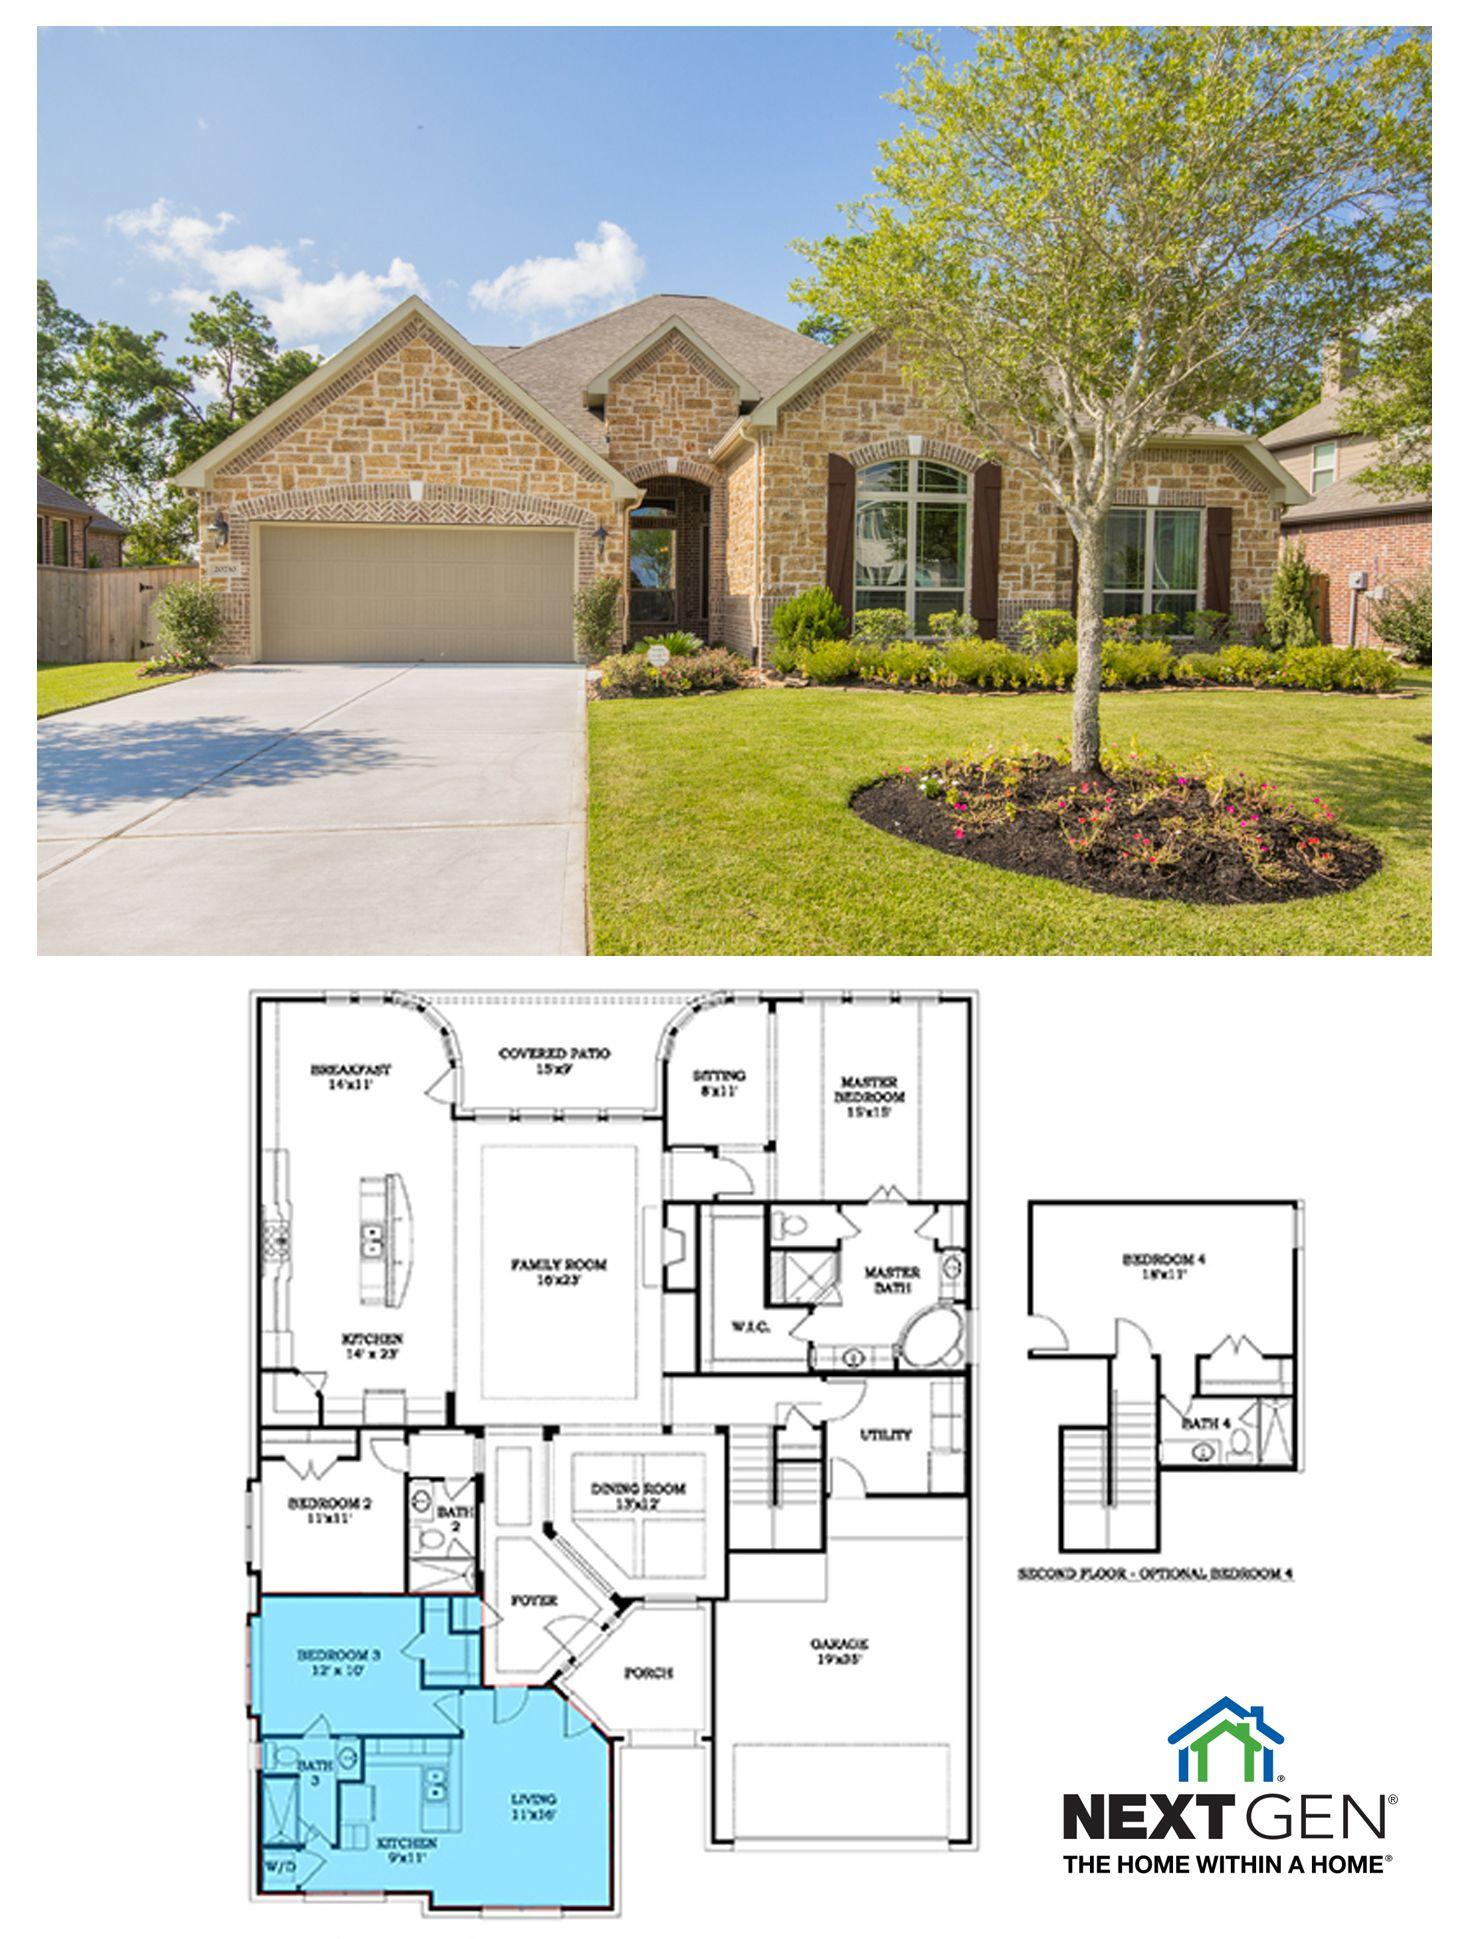 Next Gen Hadleigh Floor Plan In Oakhurst At Kingwood Porter Texas Http Villagebuilders Com Houston Home Asp Next Gen Homes House Blueprints In Law House